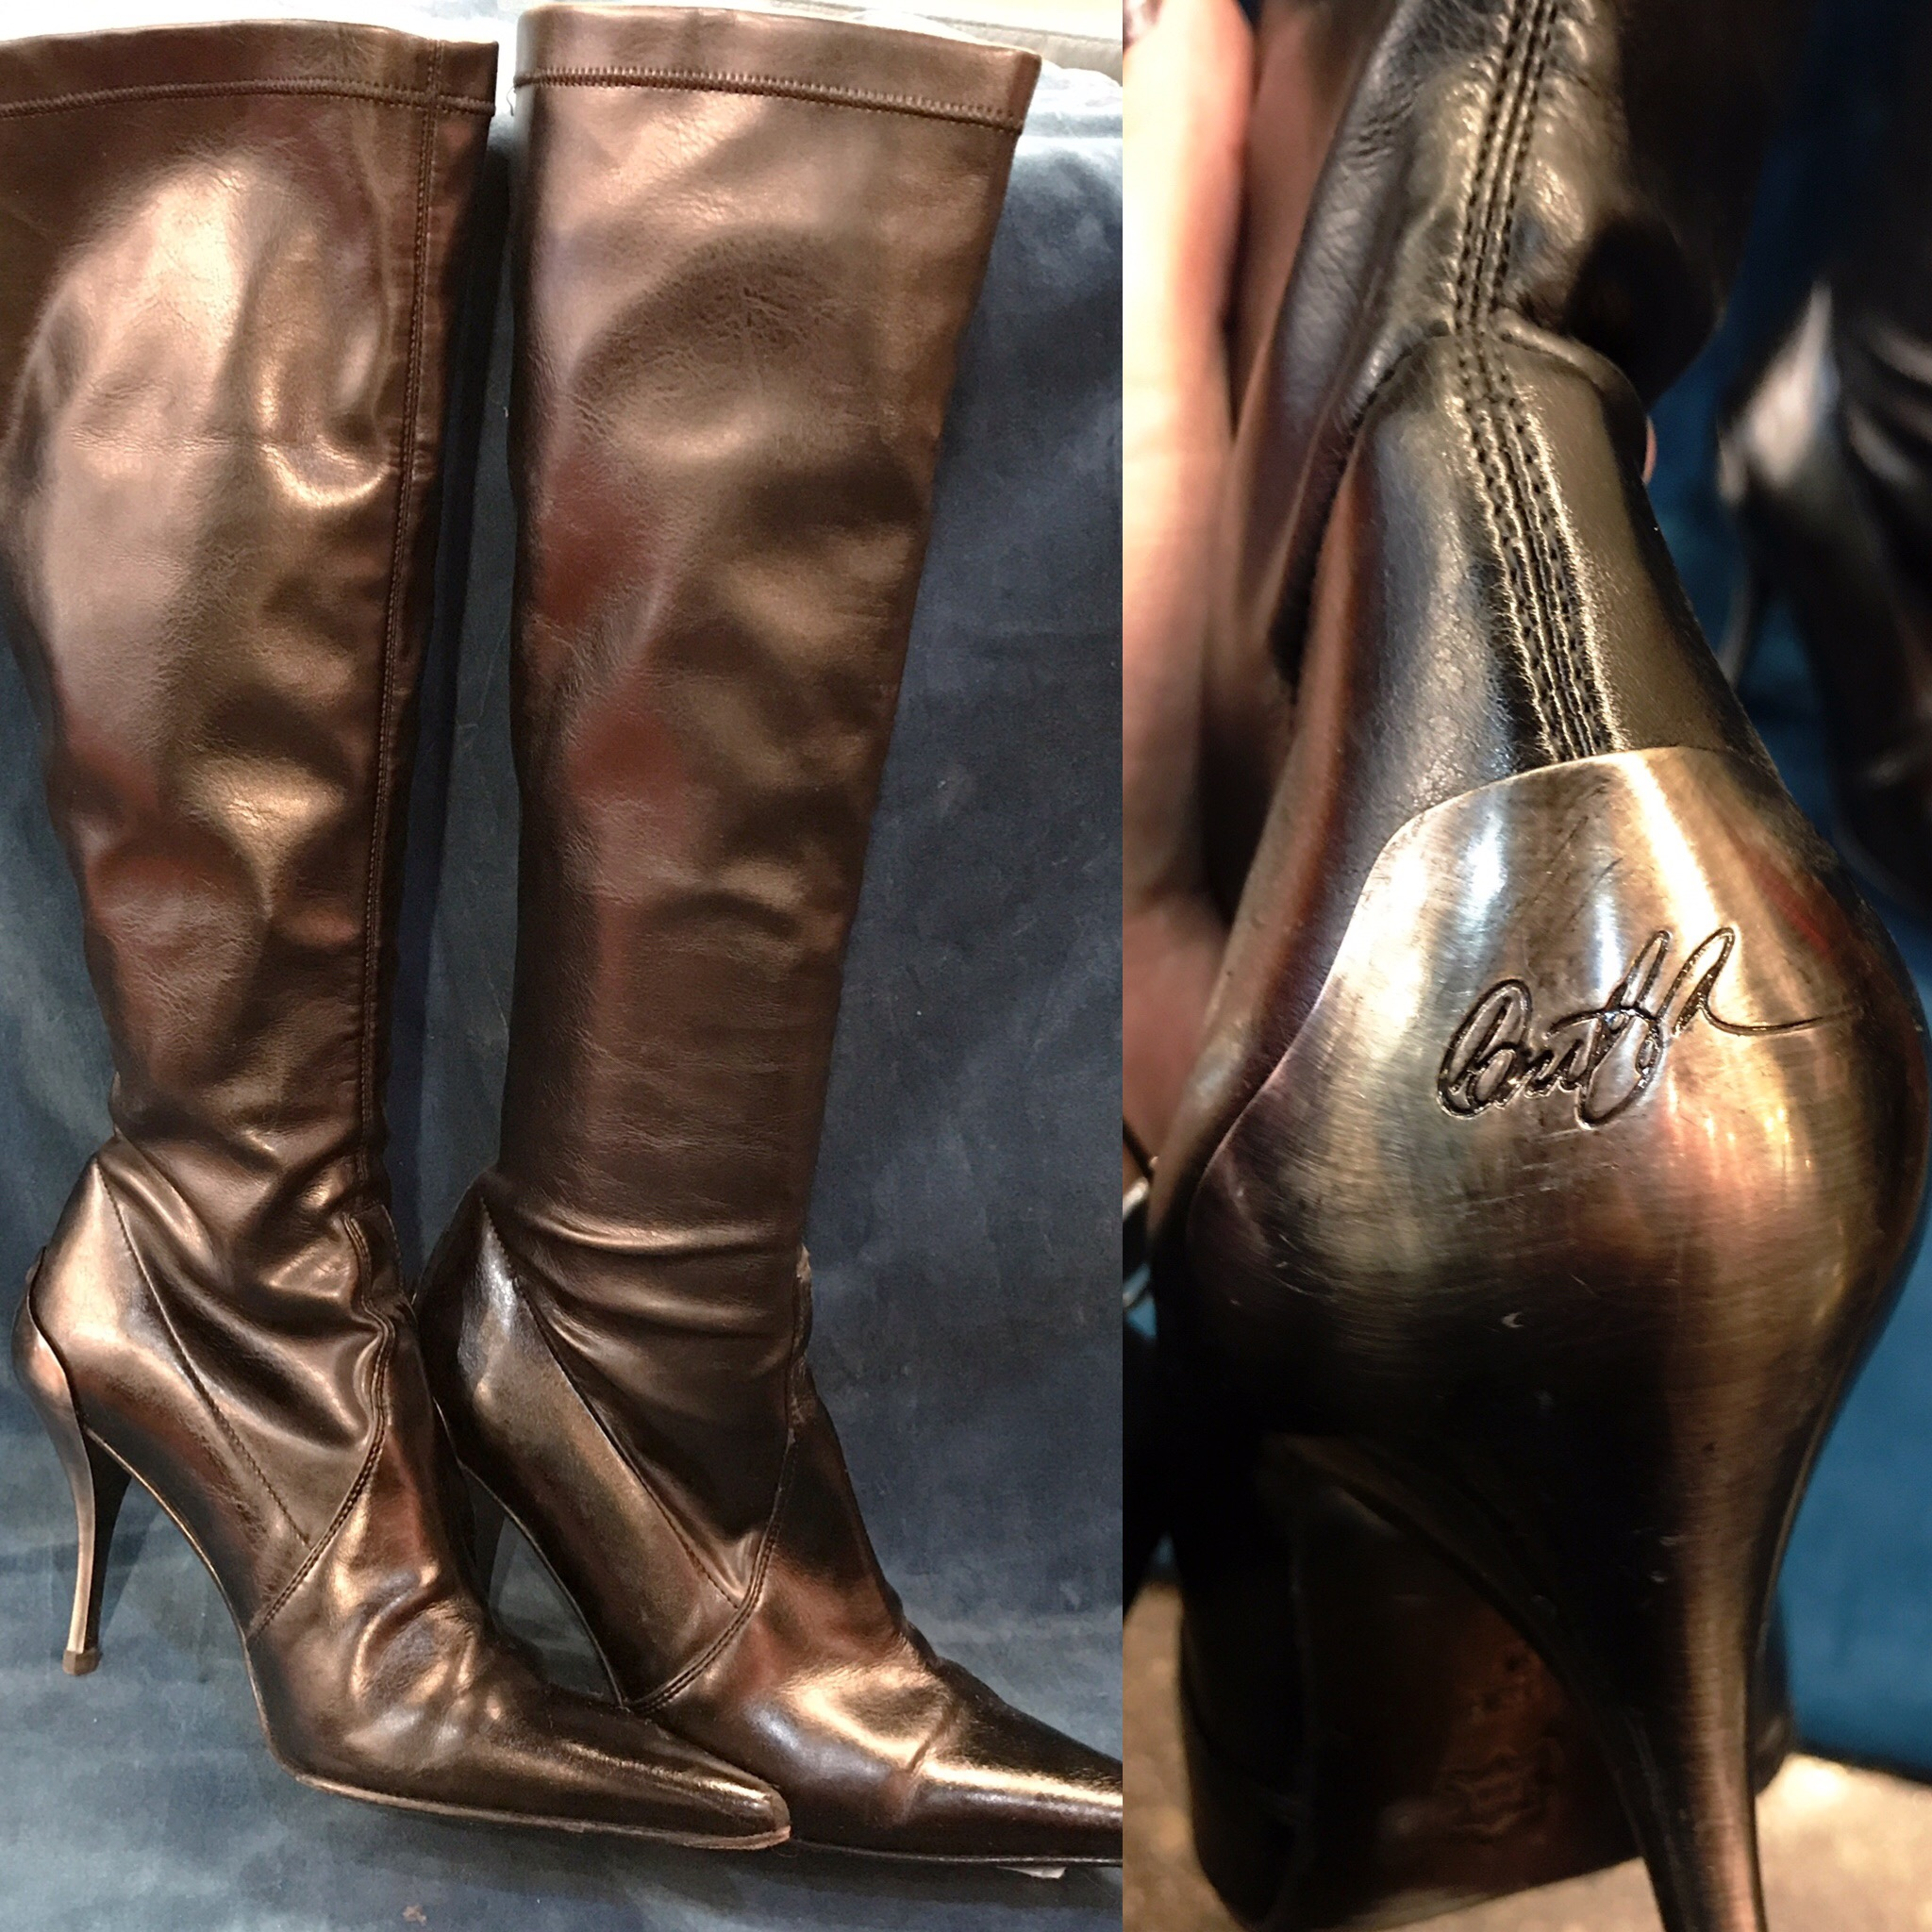 Donald J. Pliner boots, $98 (originally $480), size 6.5